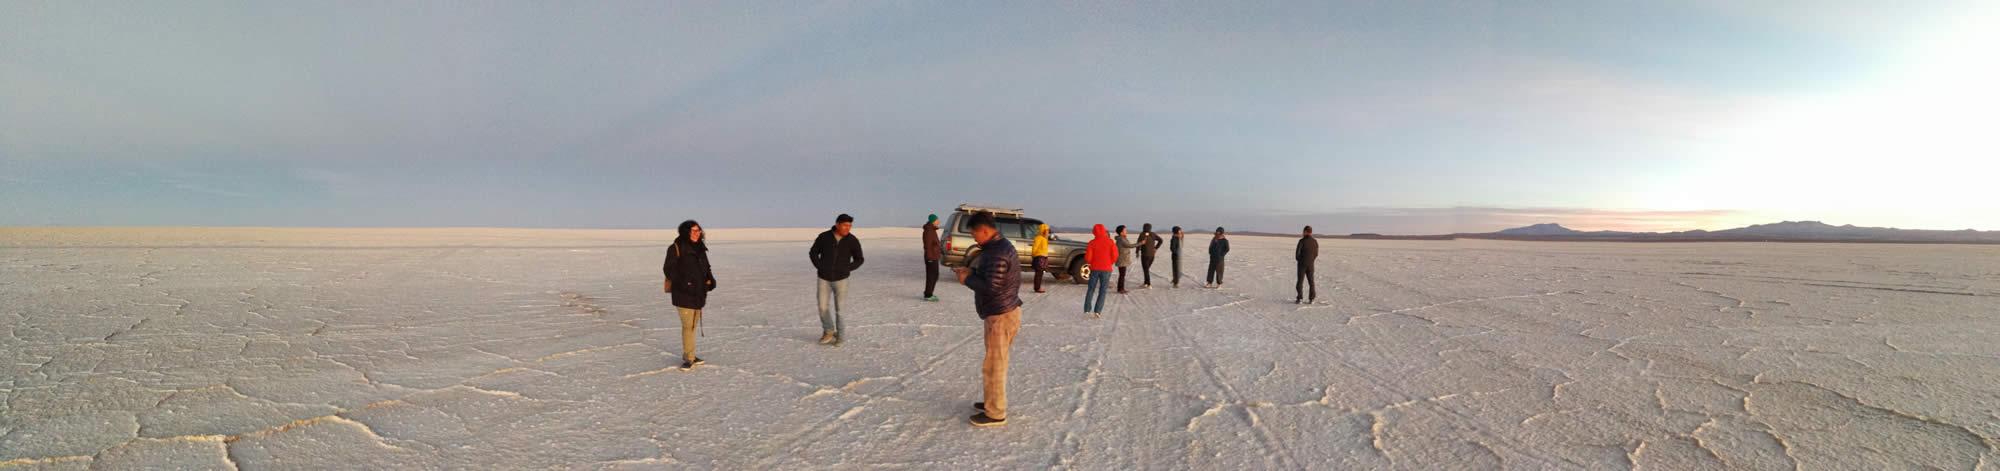 Salt Flats Bolivia Dry Desert 2020